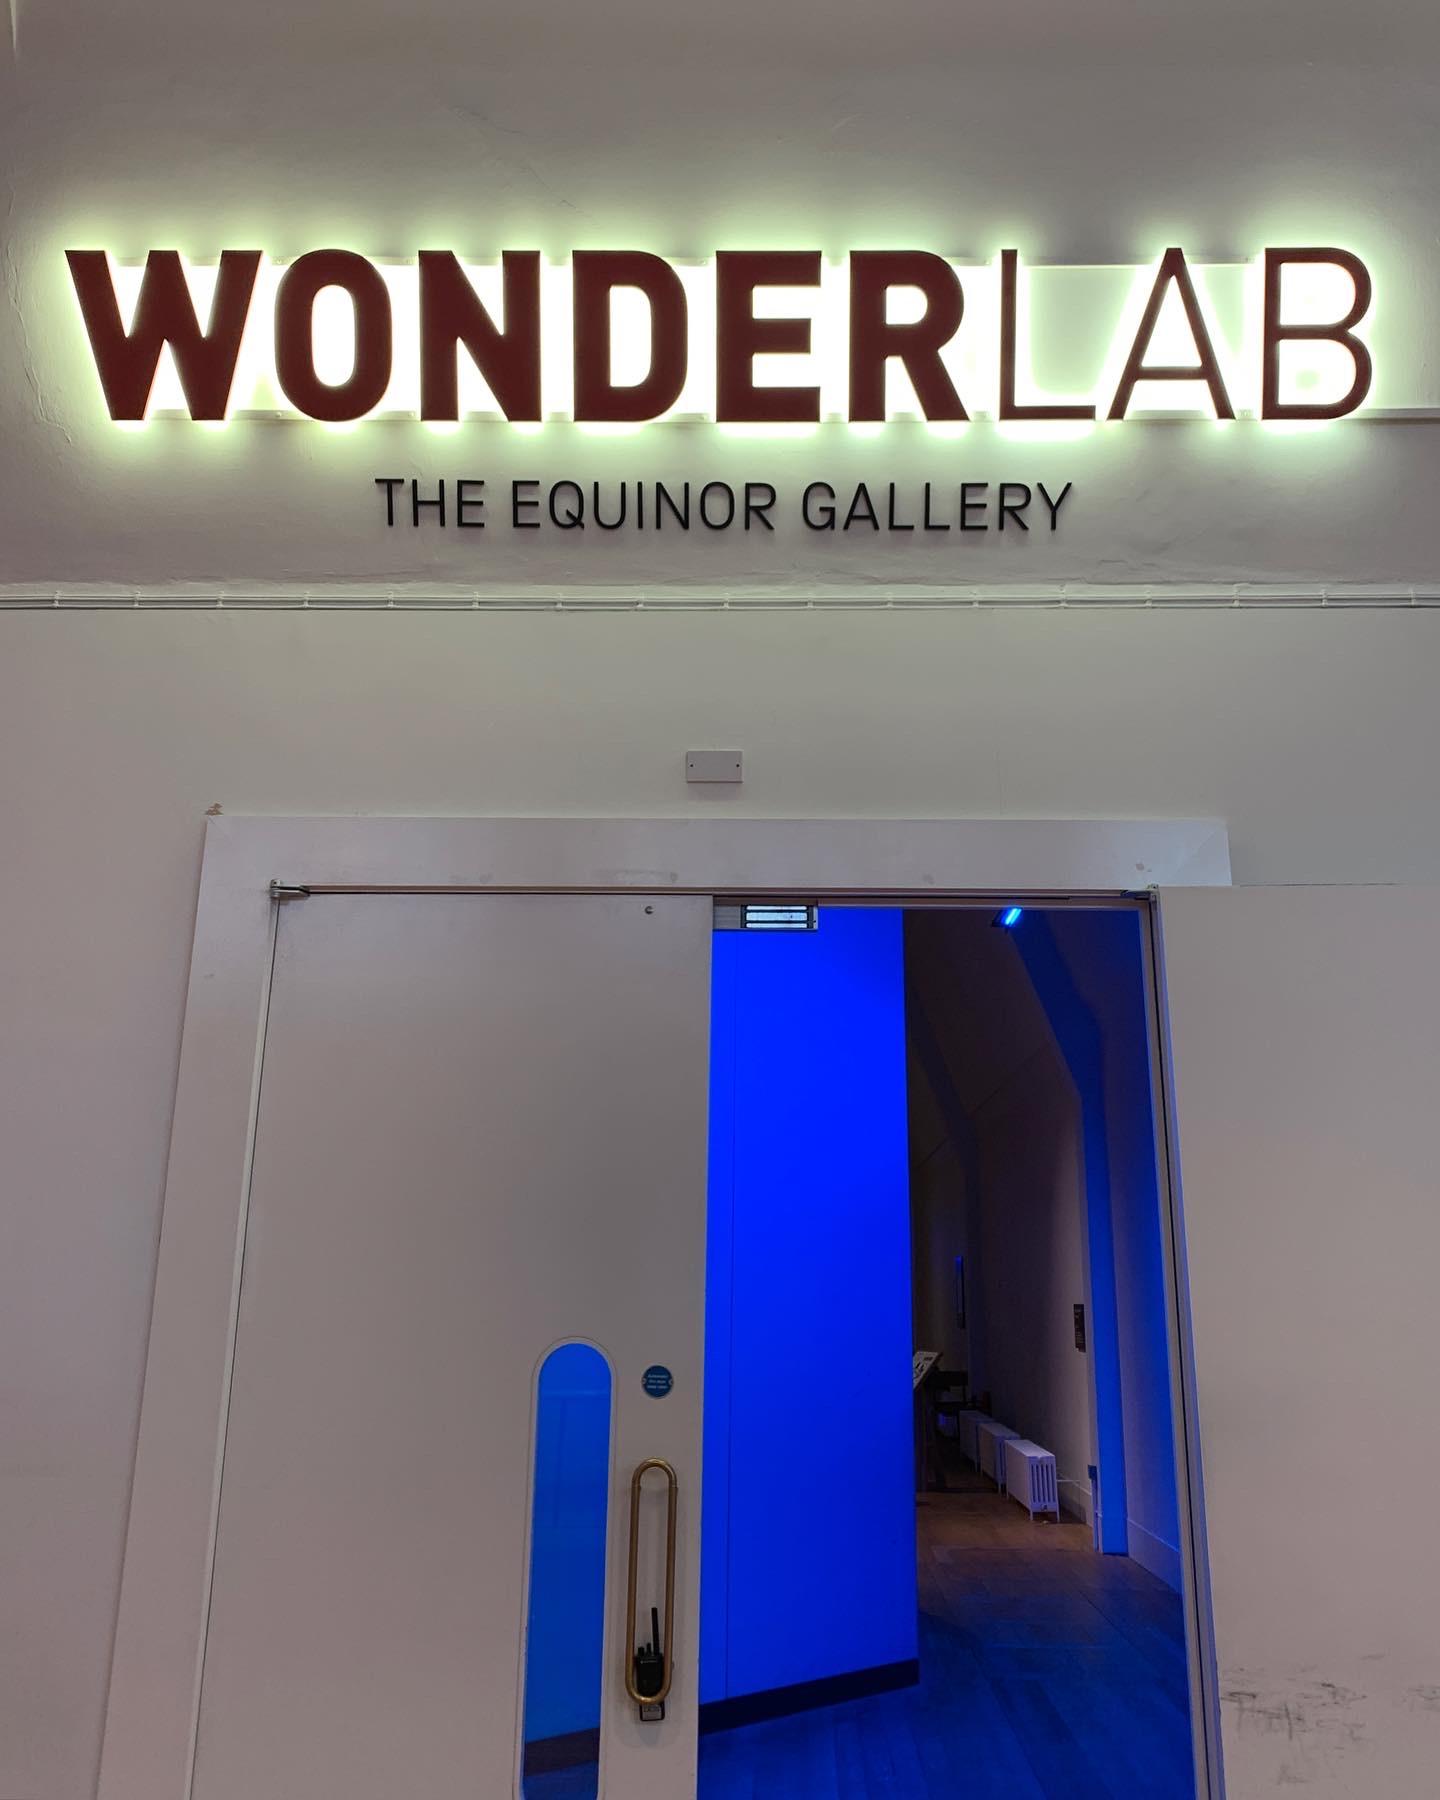 Science Museum Wonderlab